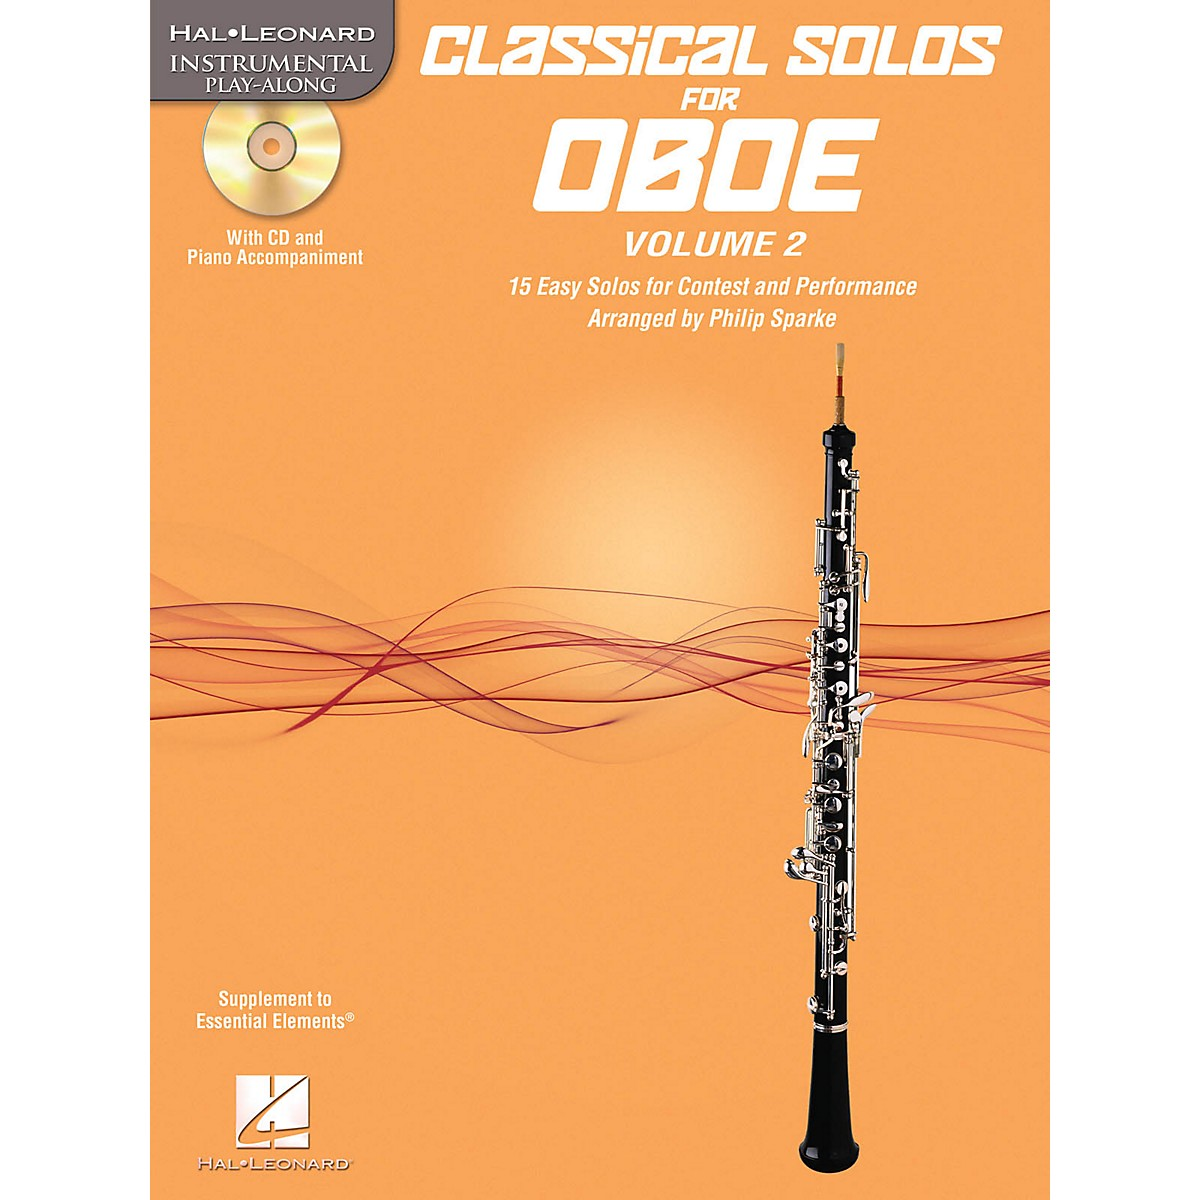 Hal Leonard Classical Solos for Oboe, Vol. 2 Instrumental Folio Series BK/CD